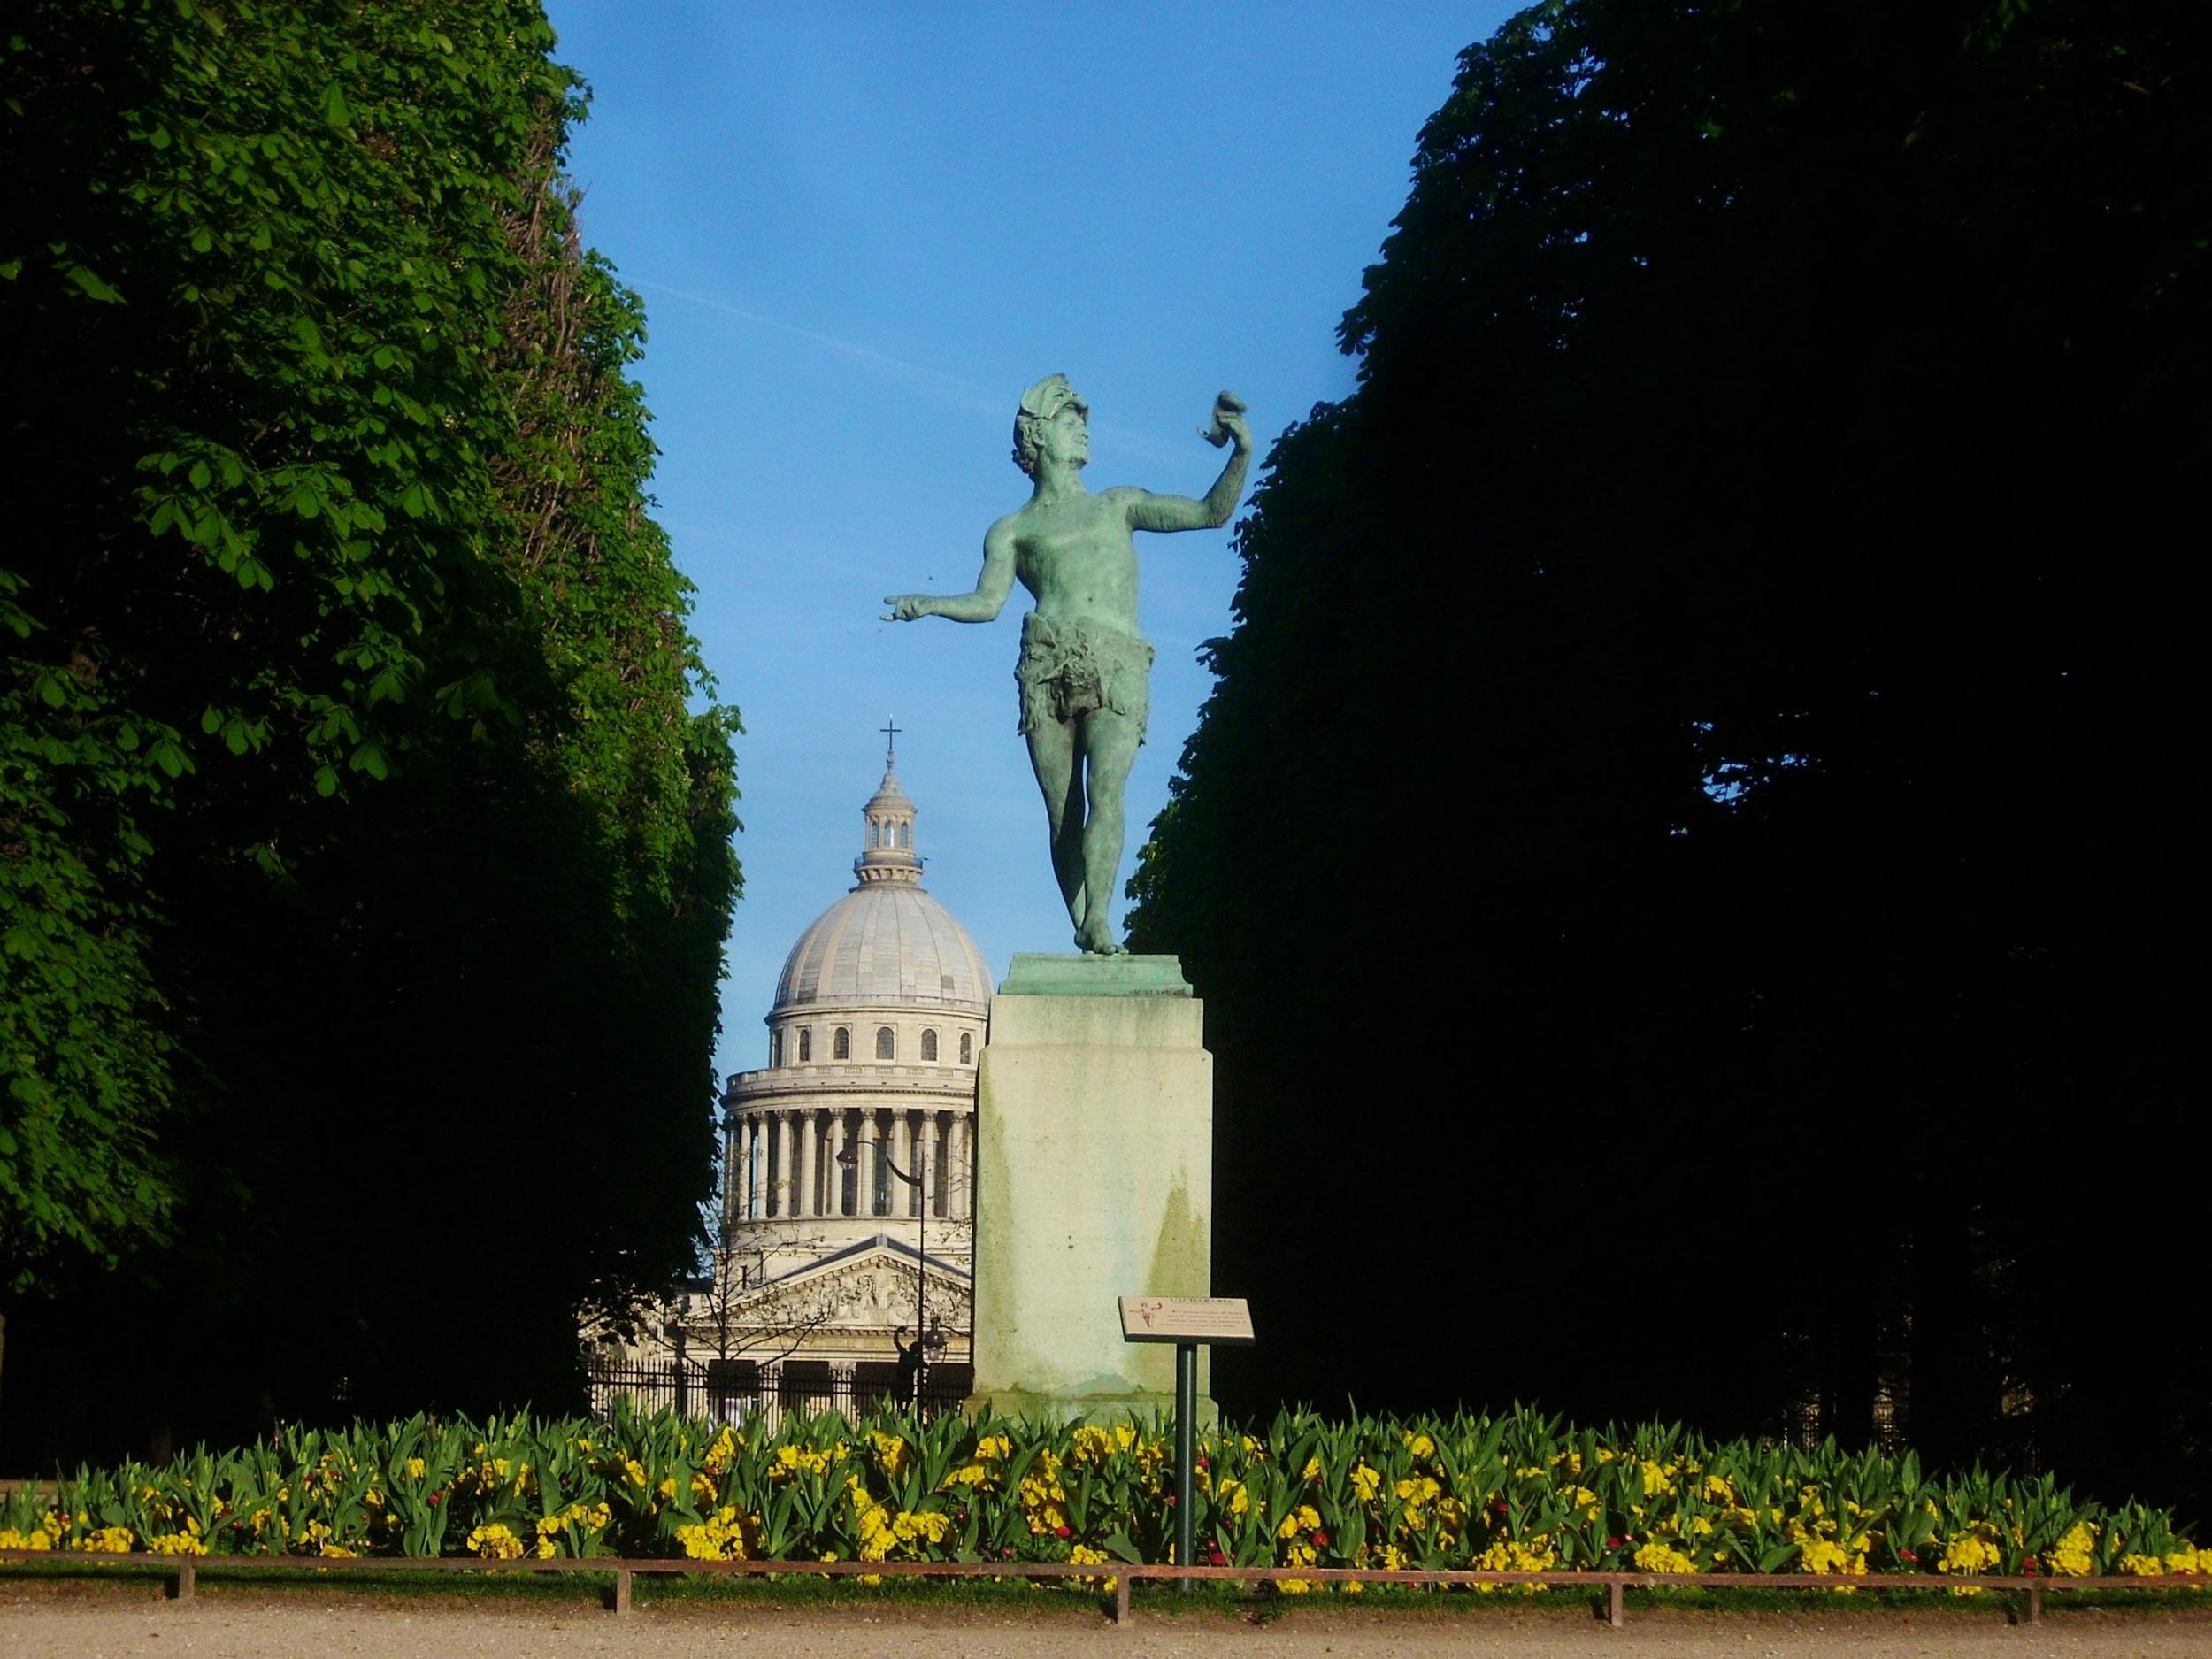 luxembourg gardens 4.jpg